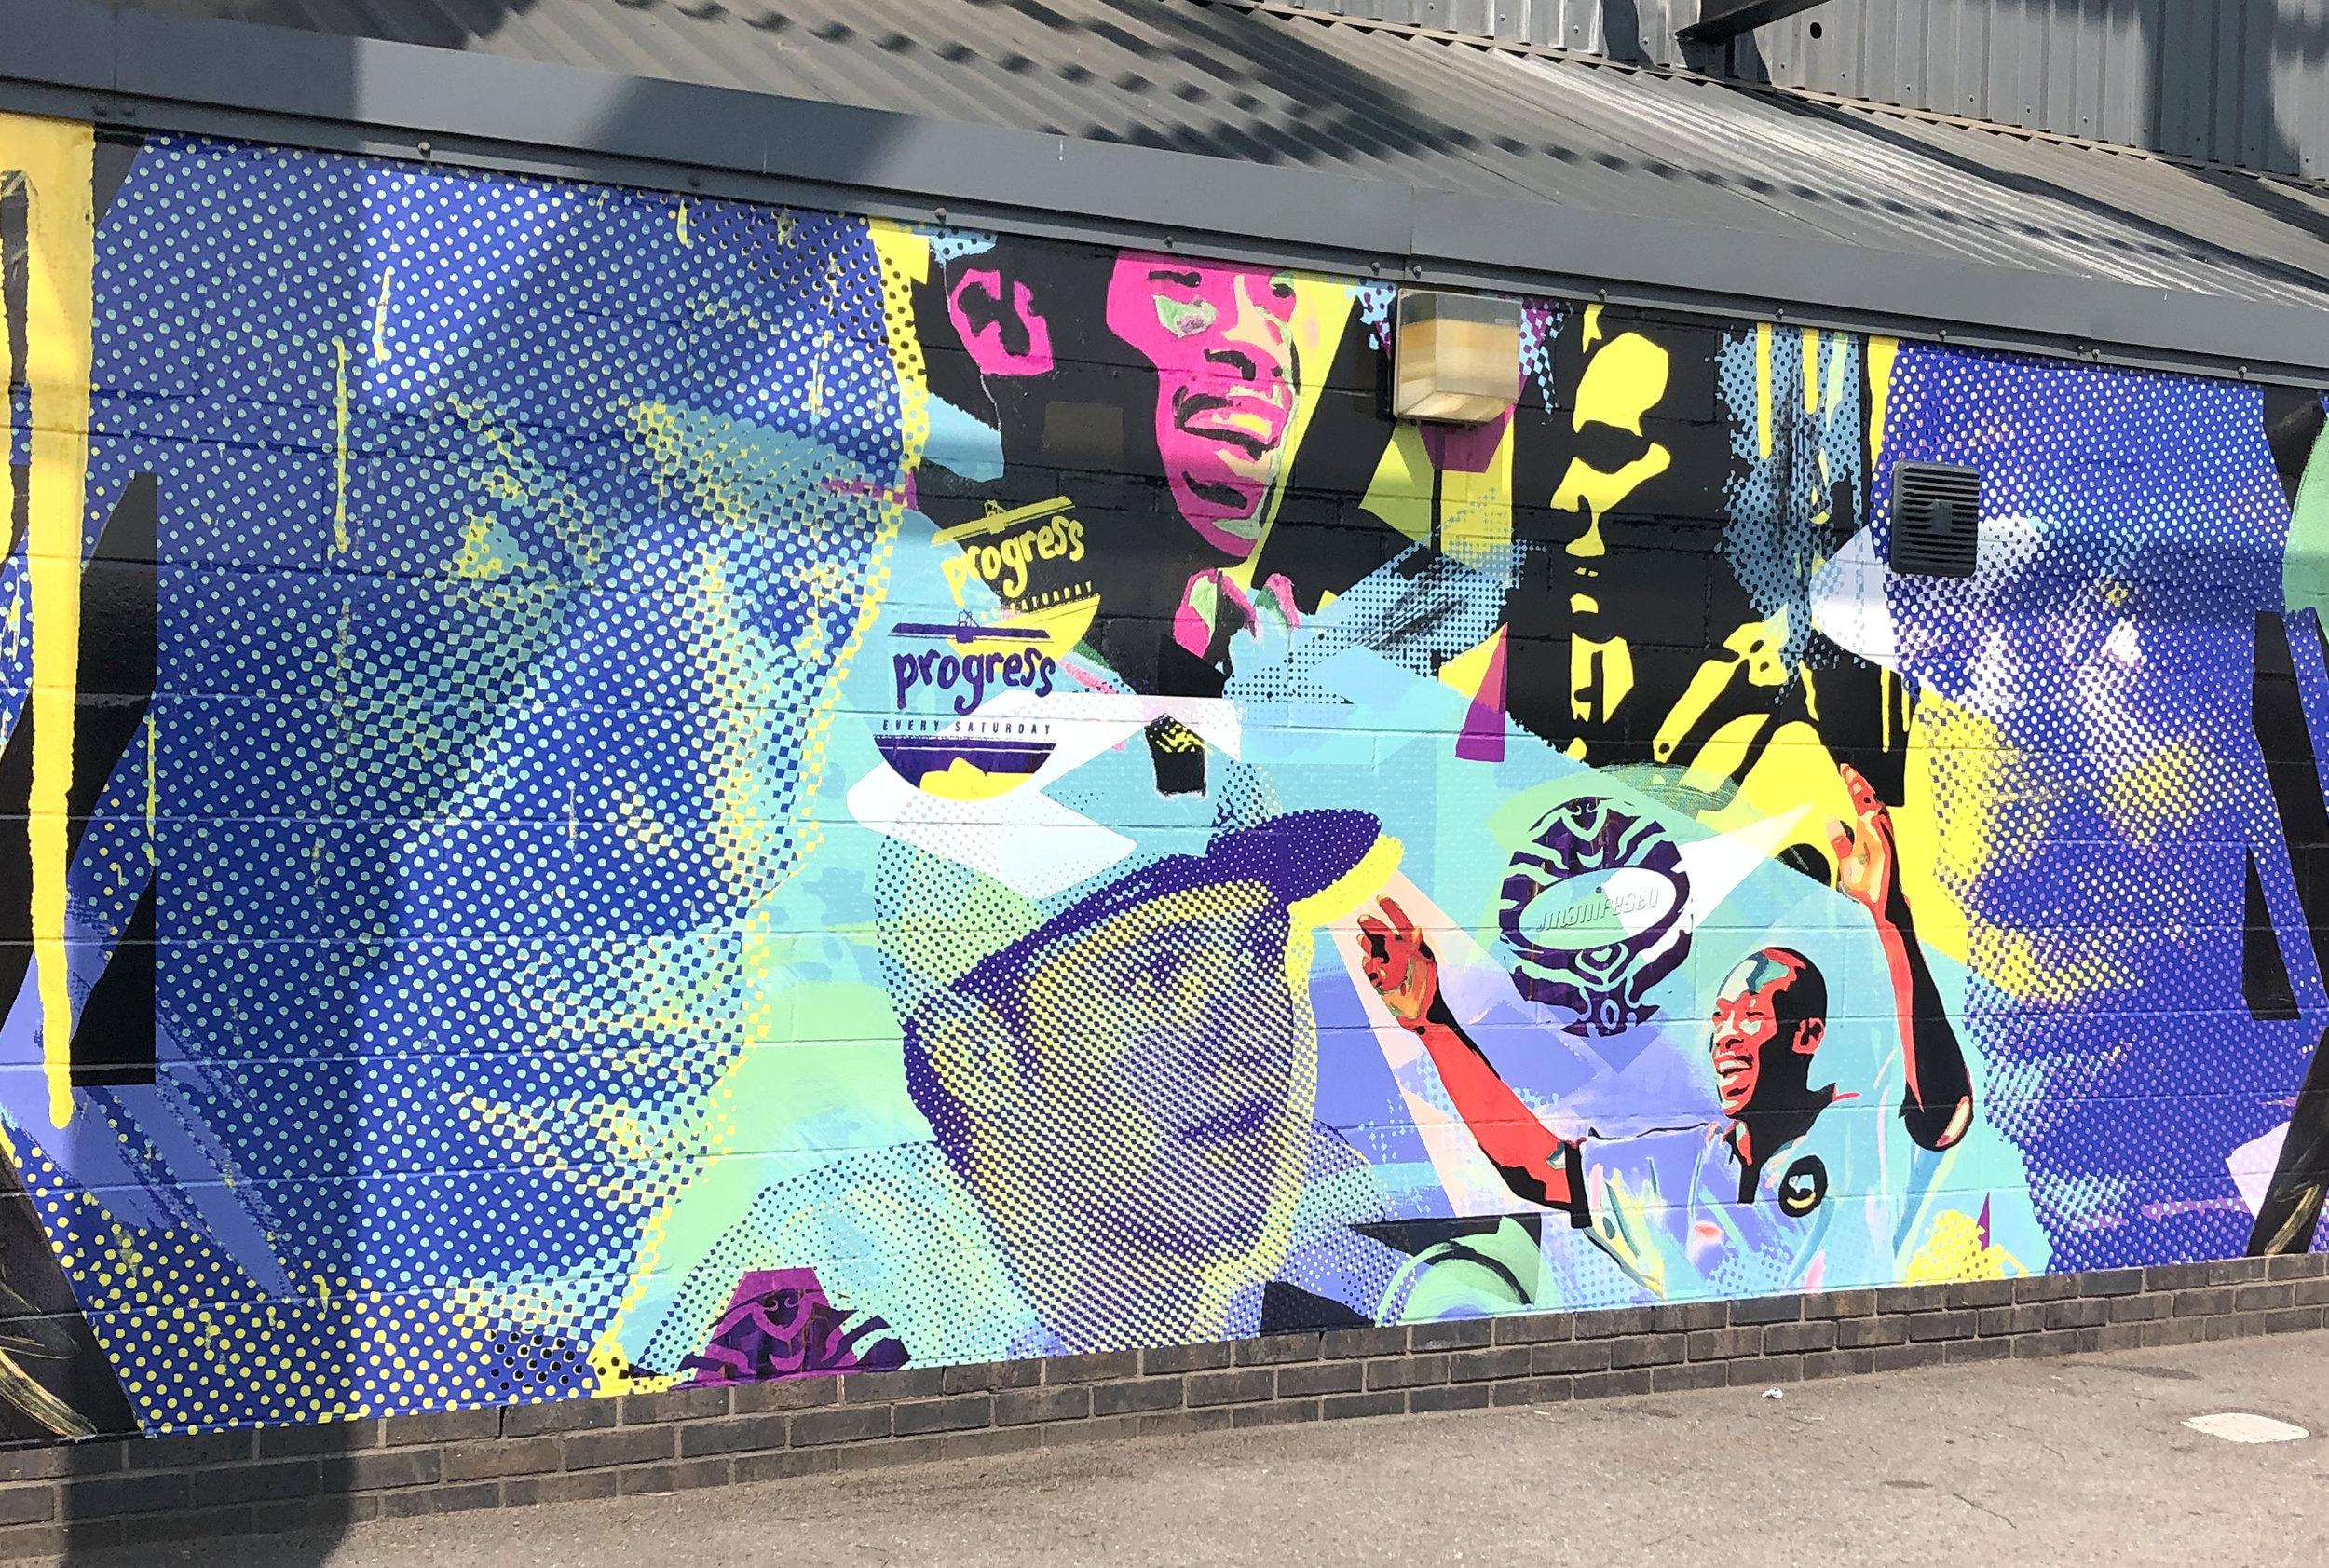 Iona Rowland_Turn Up The Bass_Mural.jpg